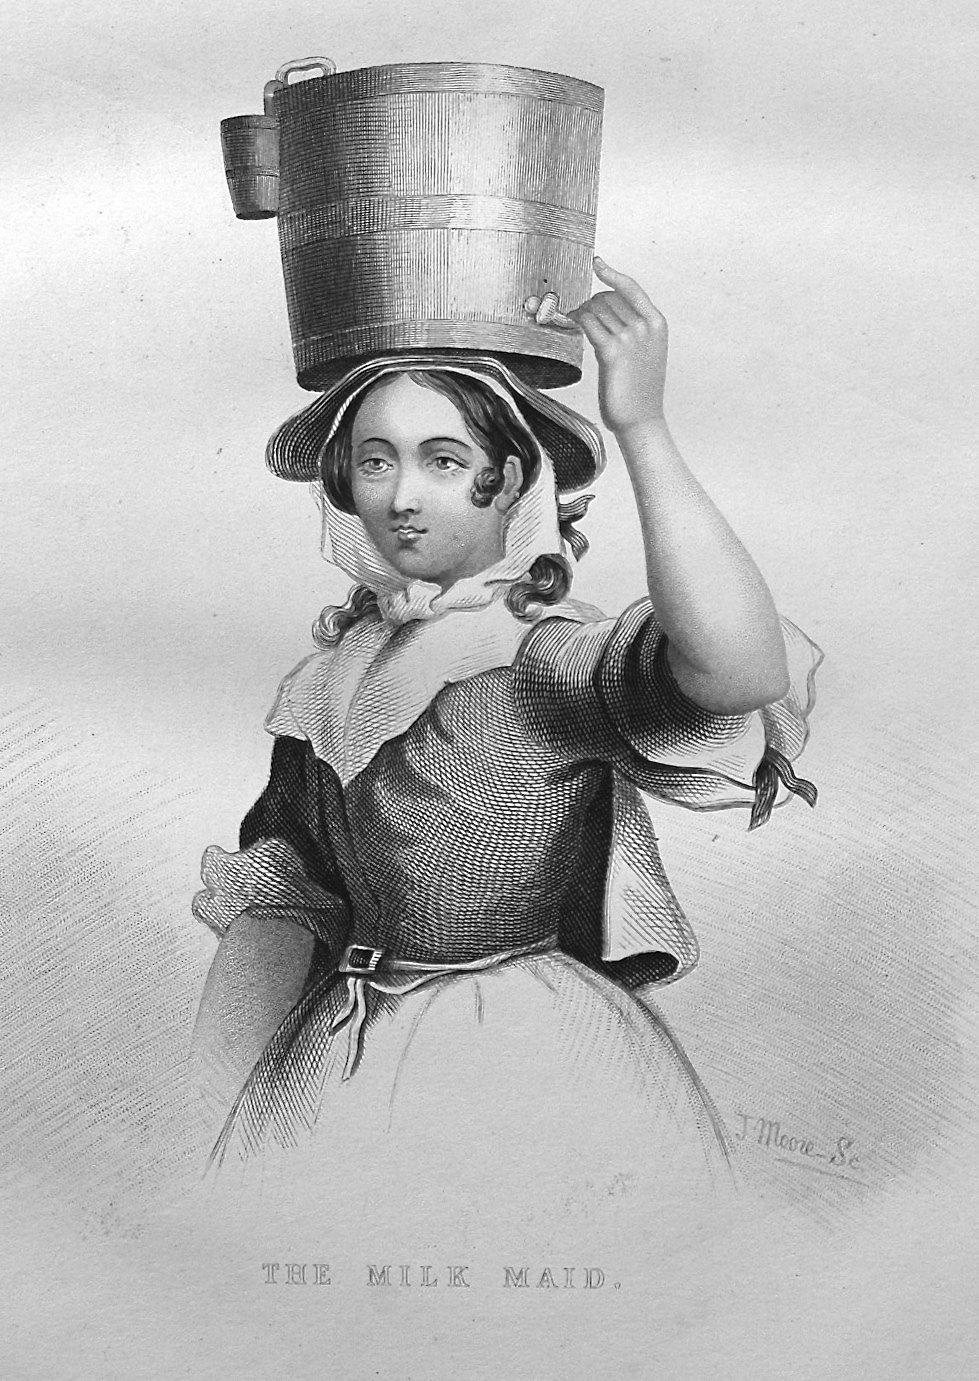 The Milk Maid. 1890